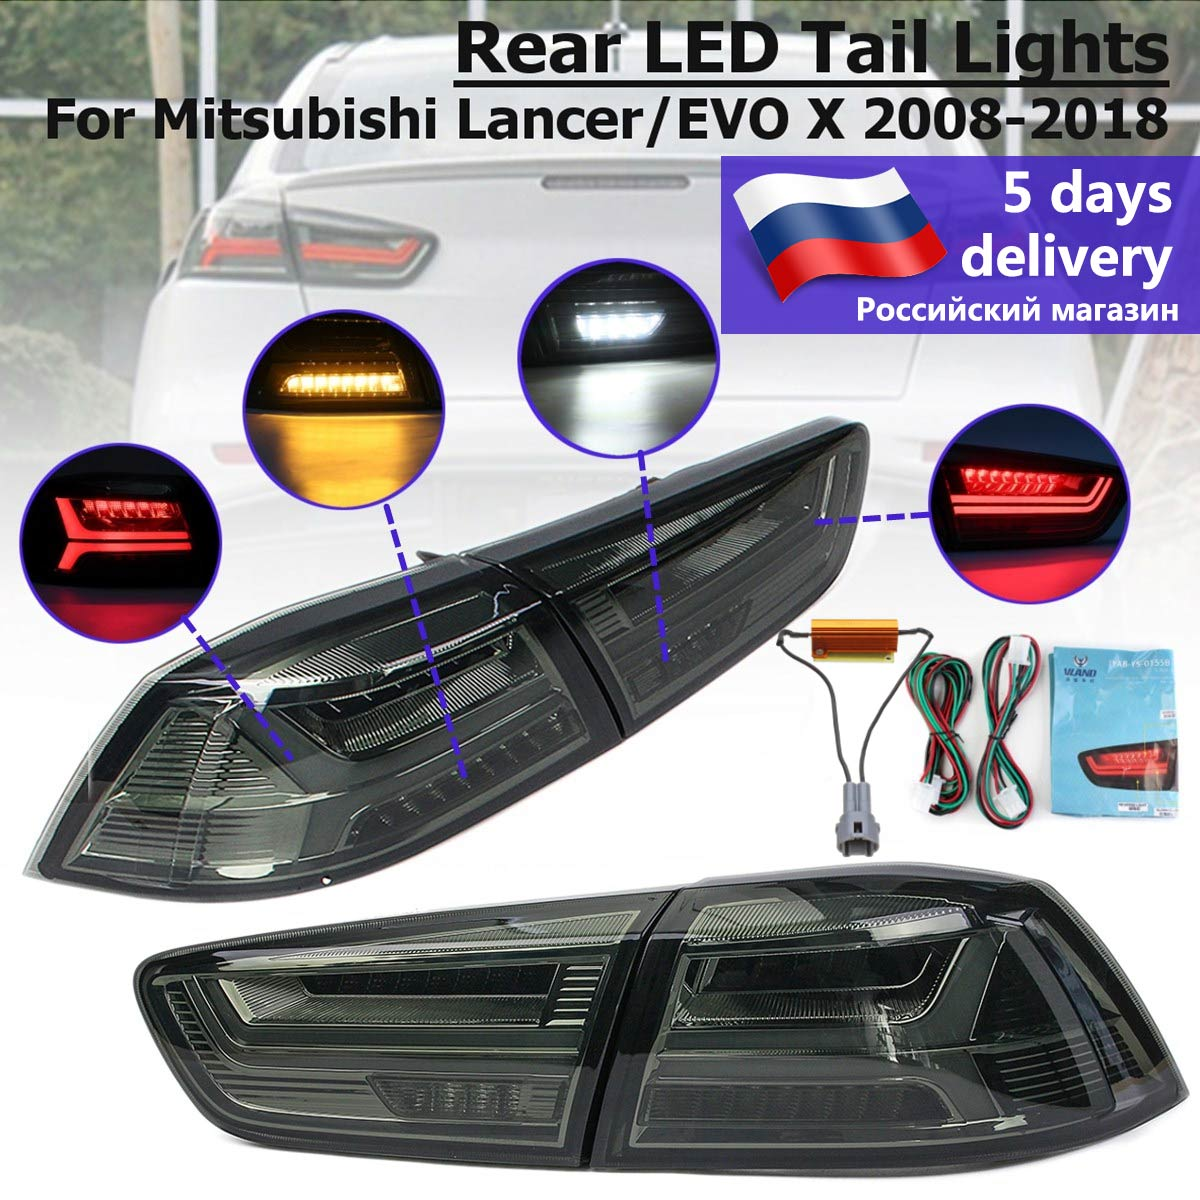 1Pair for Mitsubishi Lancer EVO x 2008-2017 Rear LED Tail Brake Light Lamp Tail Light Signal LED DRL Stop Rear Lamp Accessories